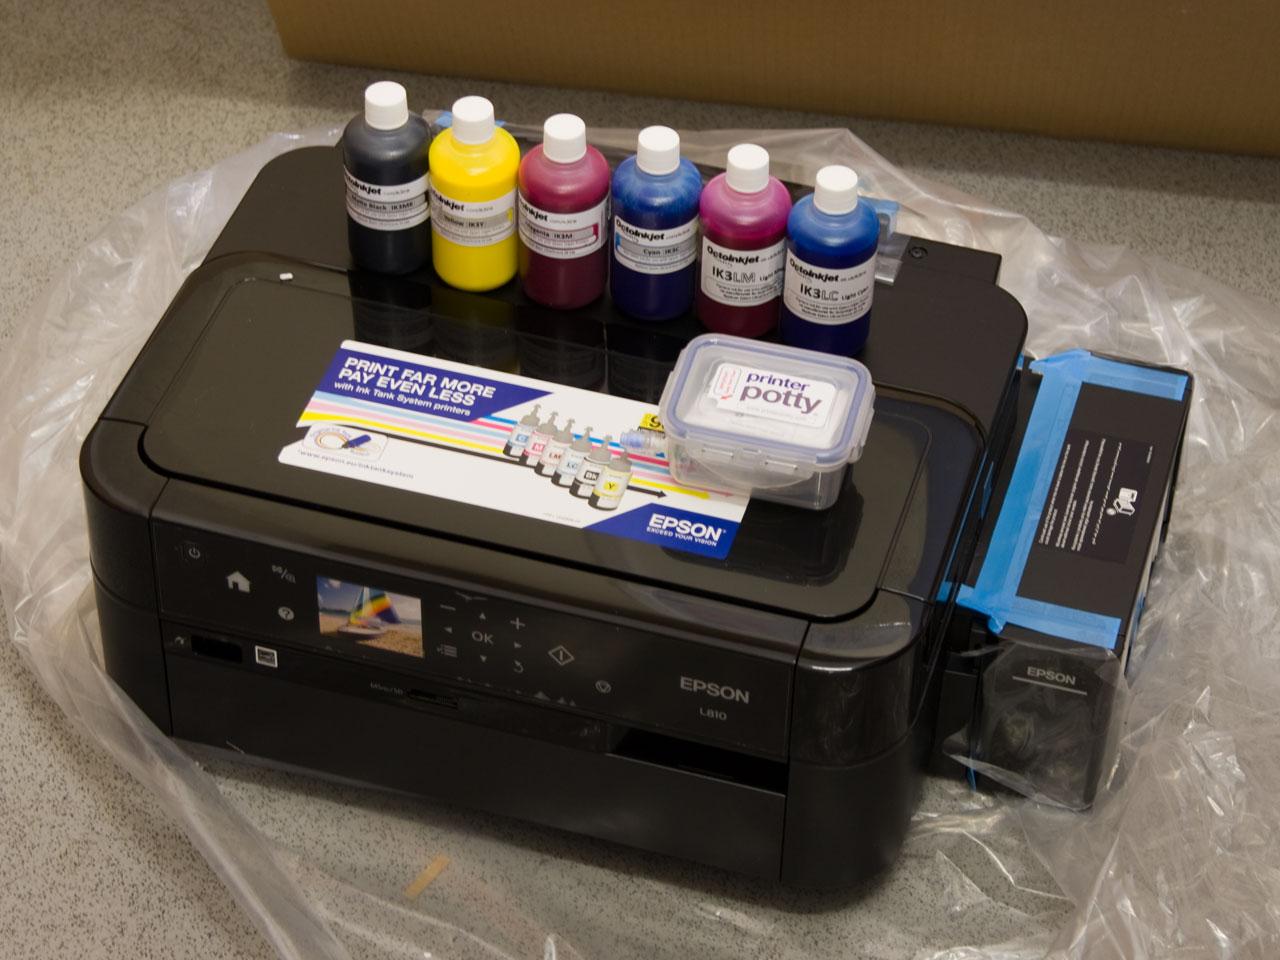 Details about Epson Ecotank L810 inc' Pigment inks + Printer Potty  [New/Unused]